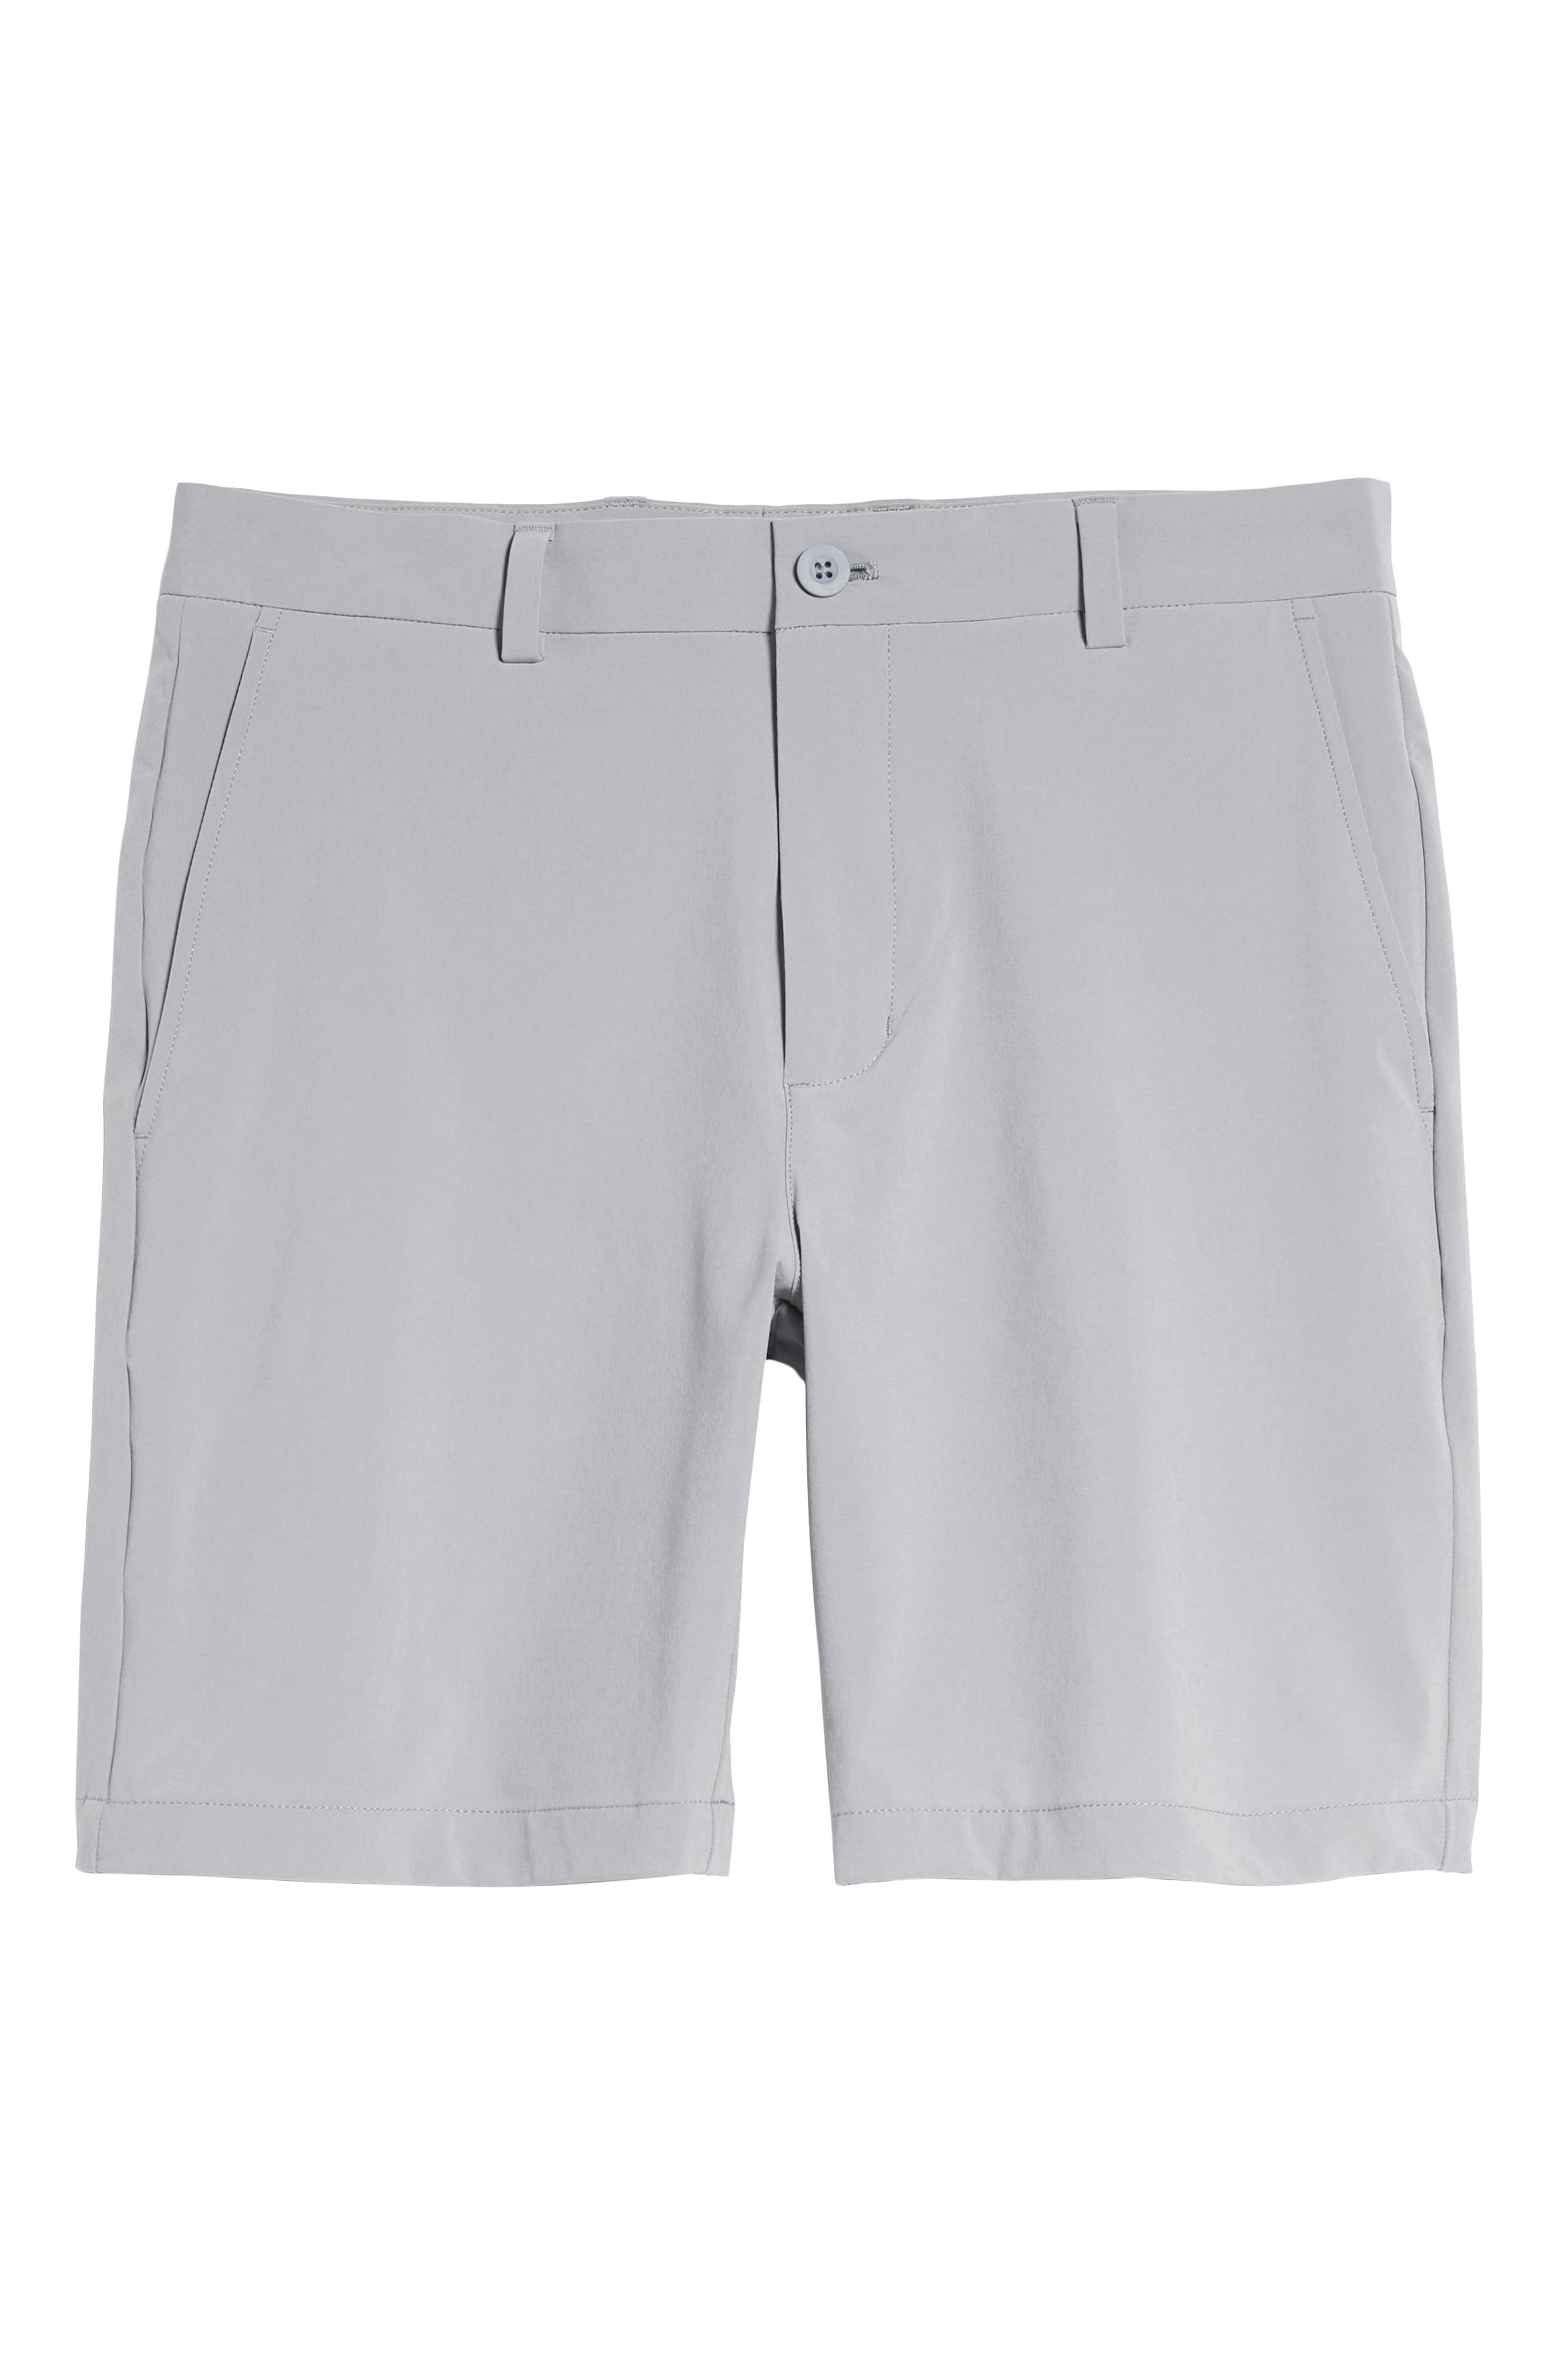 8 Inch Performance Breaker Shorts,                             Alternate thumbnail 17, color,